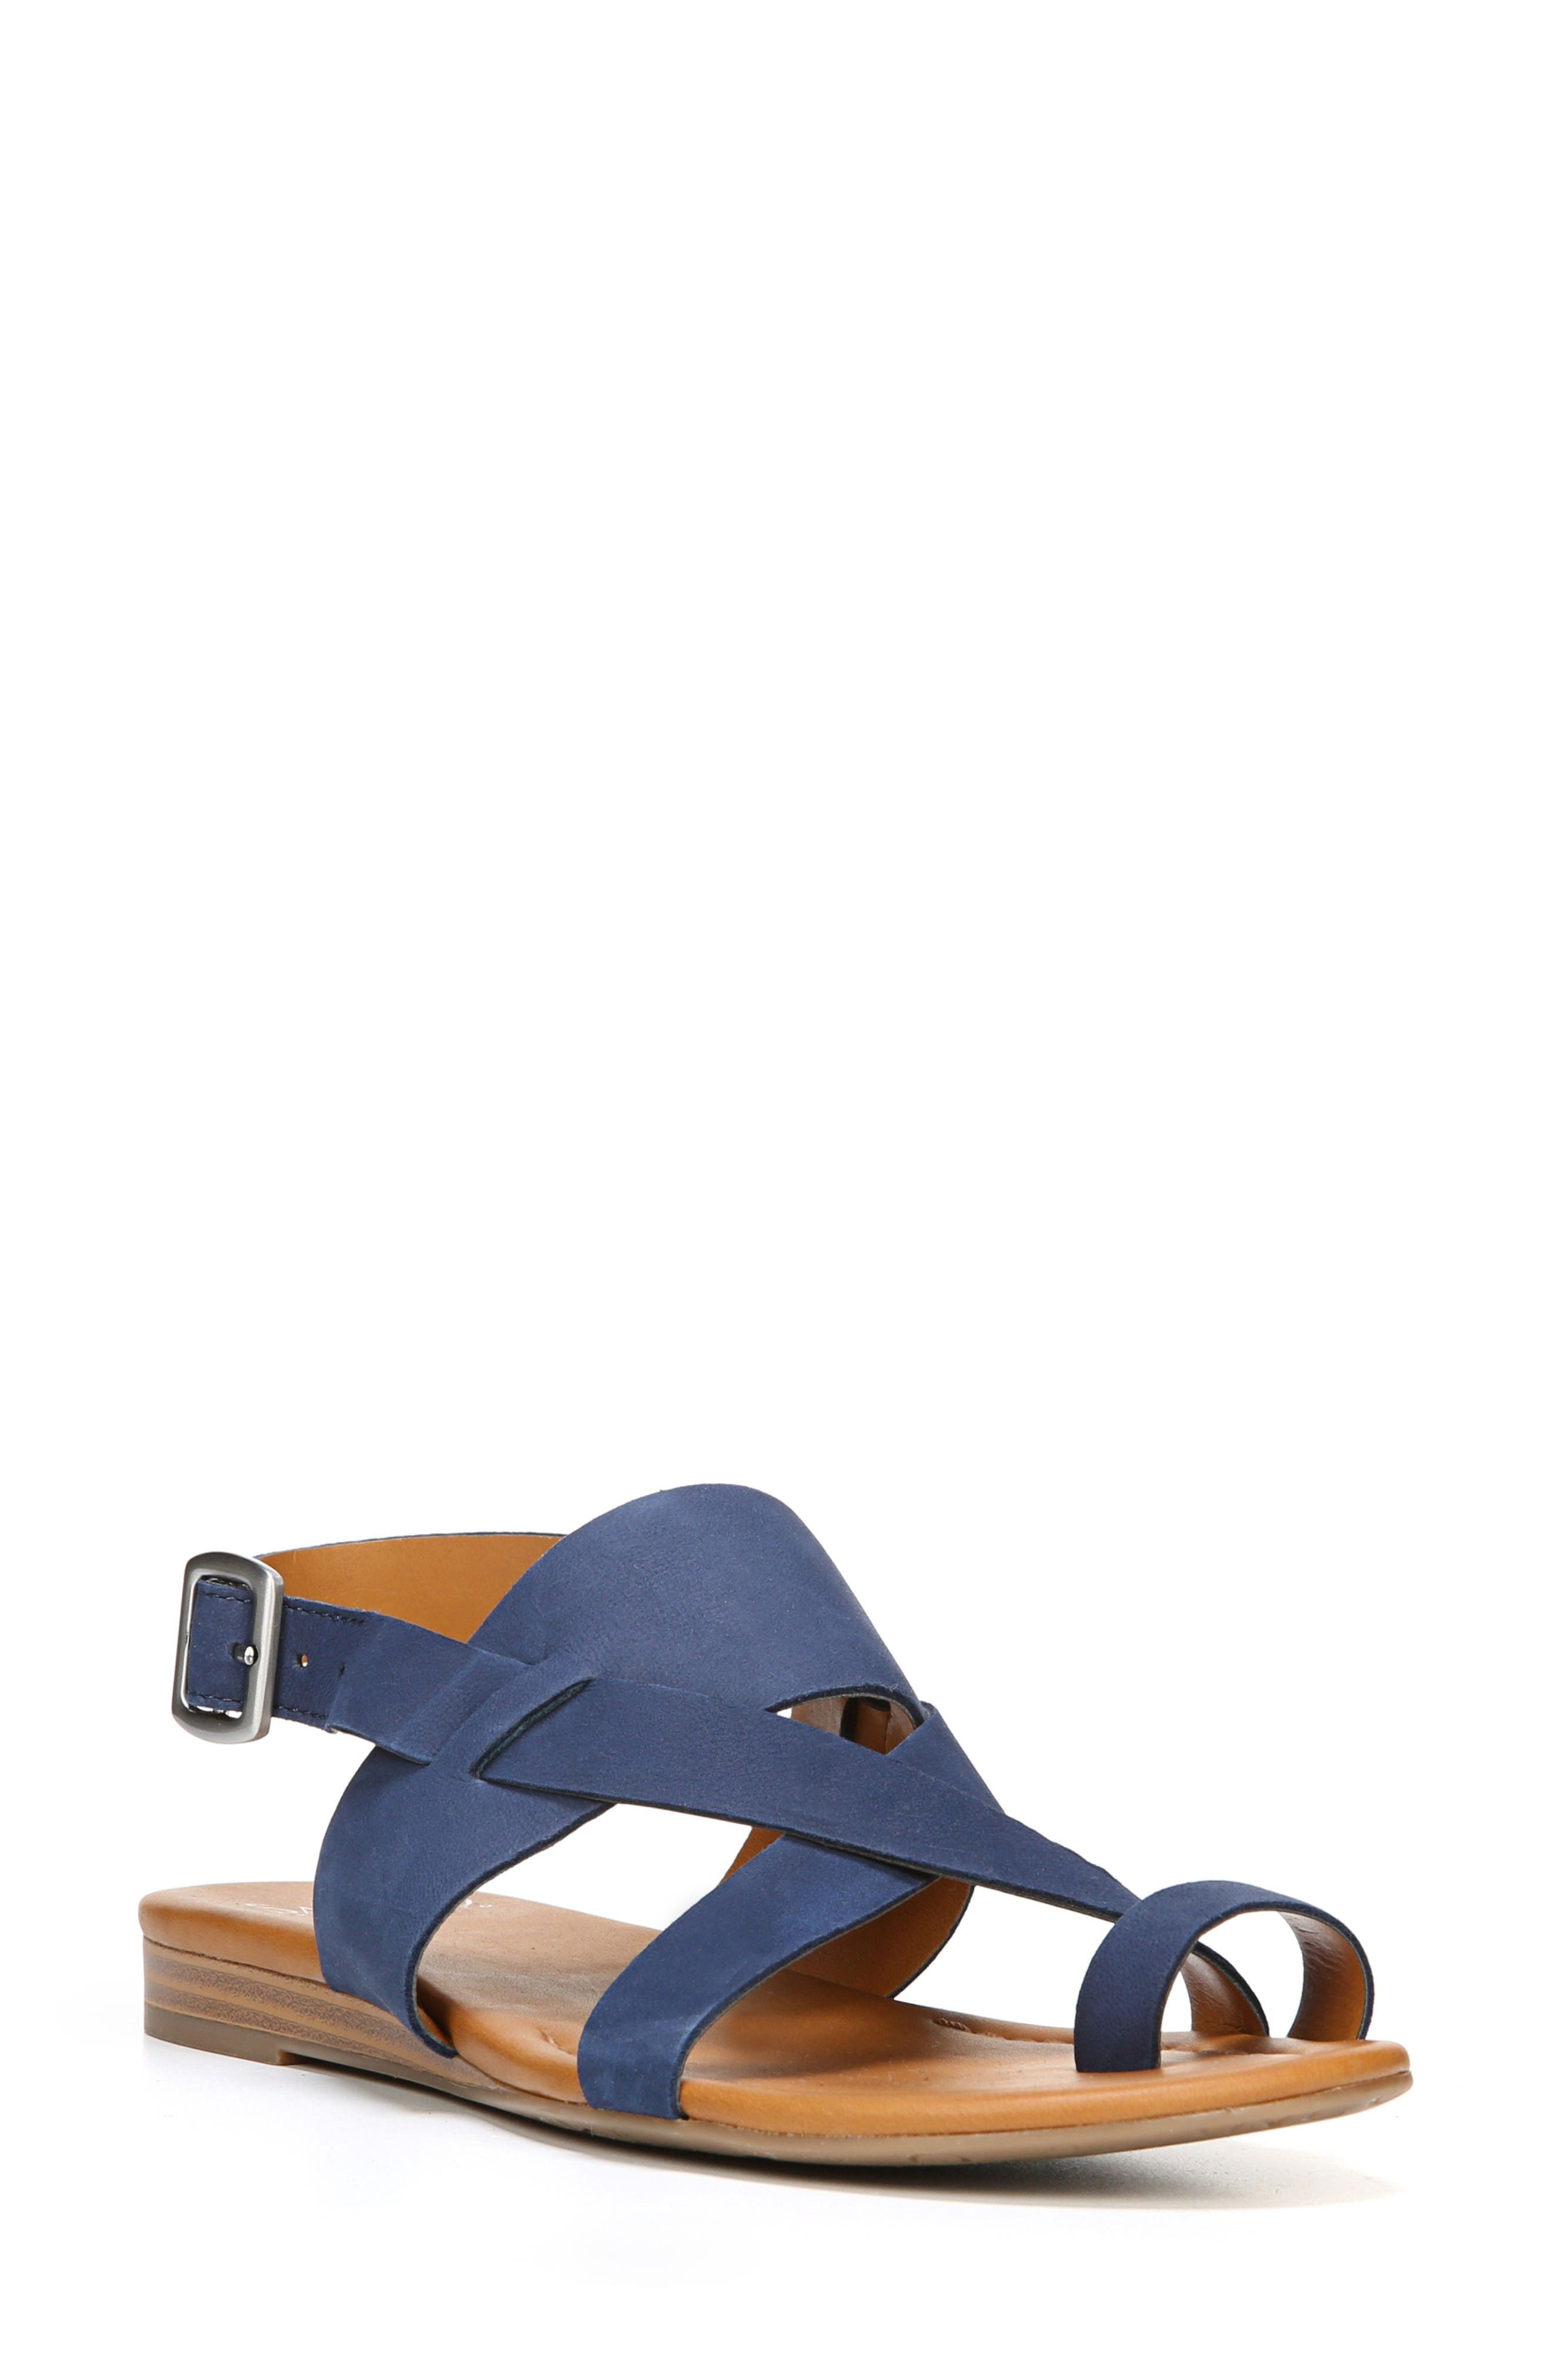 Main Image - Franco Sarto 'Gia' Sandal